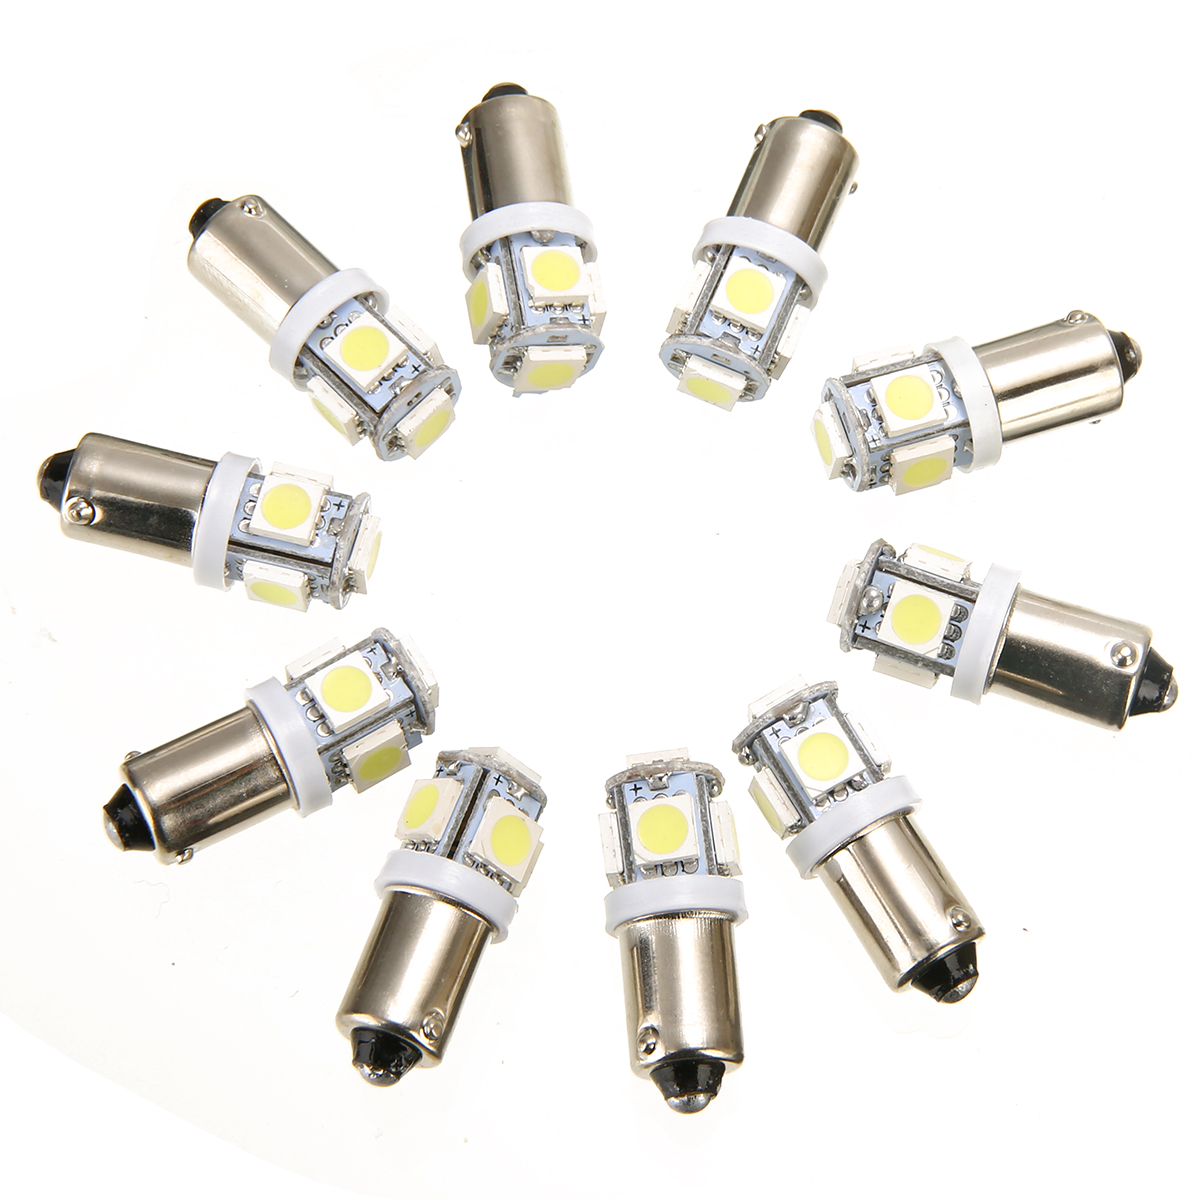 10pcs 12V T11 BA9S 5SMD LEDs Bulb T4W 3886X H6W 363 5050 Super White Car Interior Dome Map Light Signal Lamp